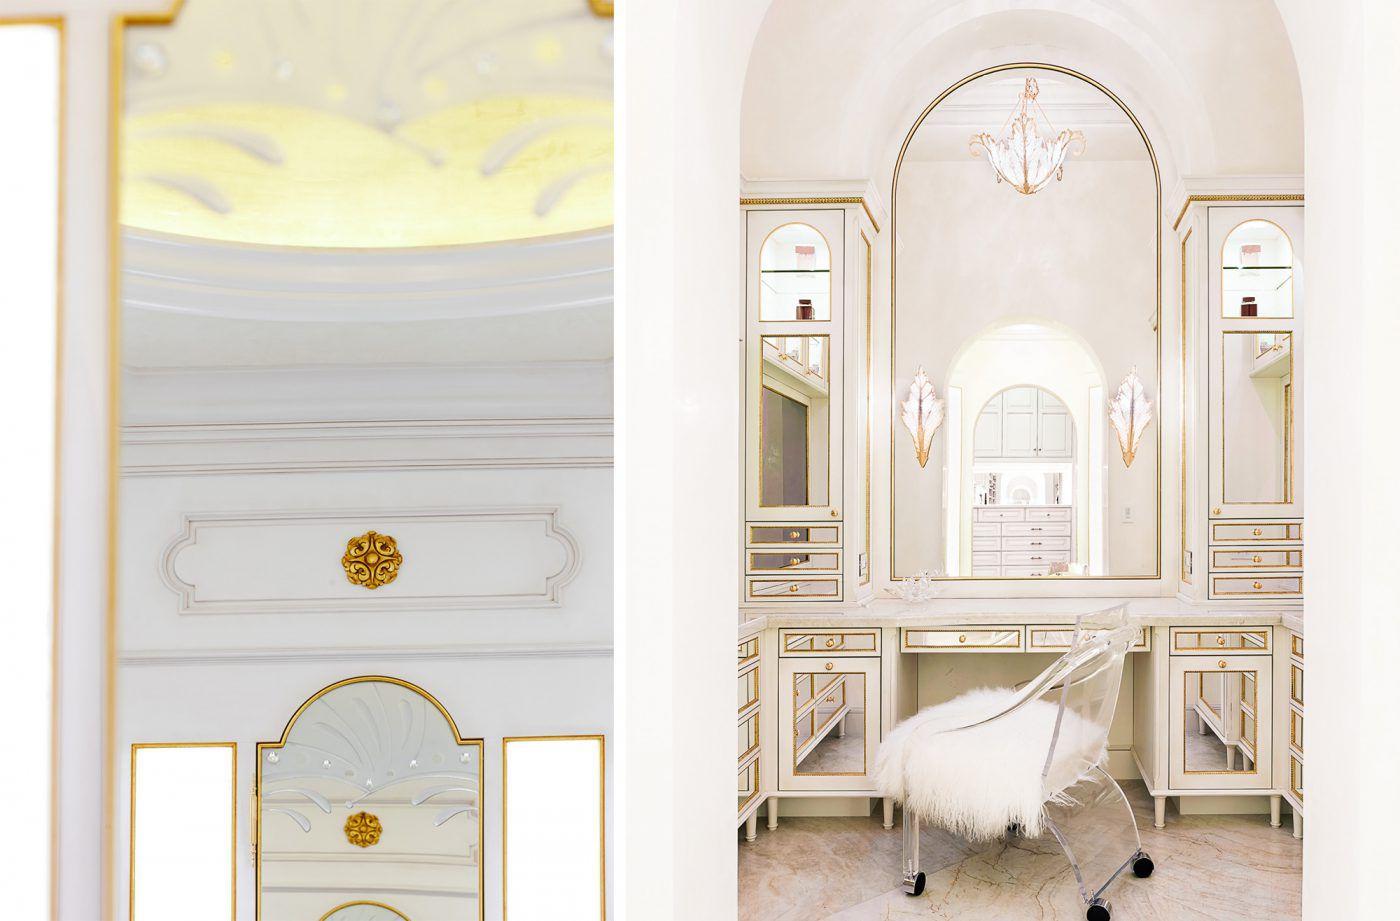 White-and-gold-mirrored-vanity